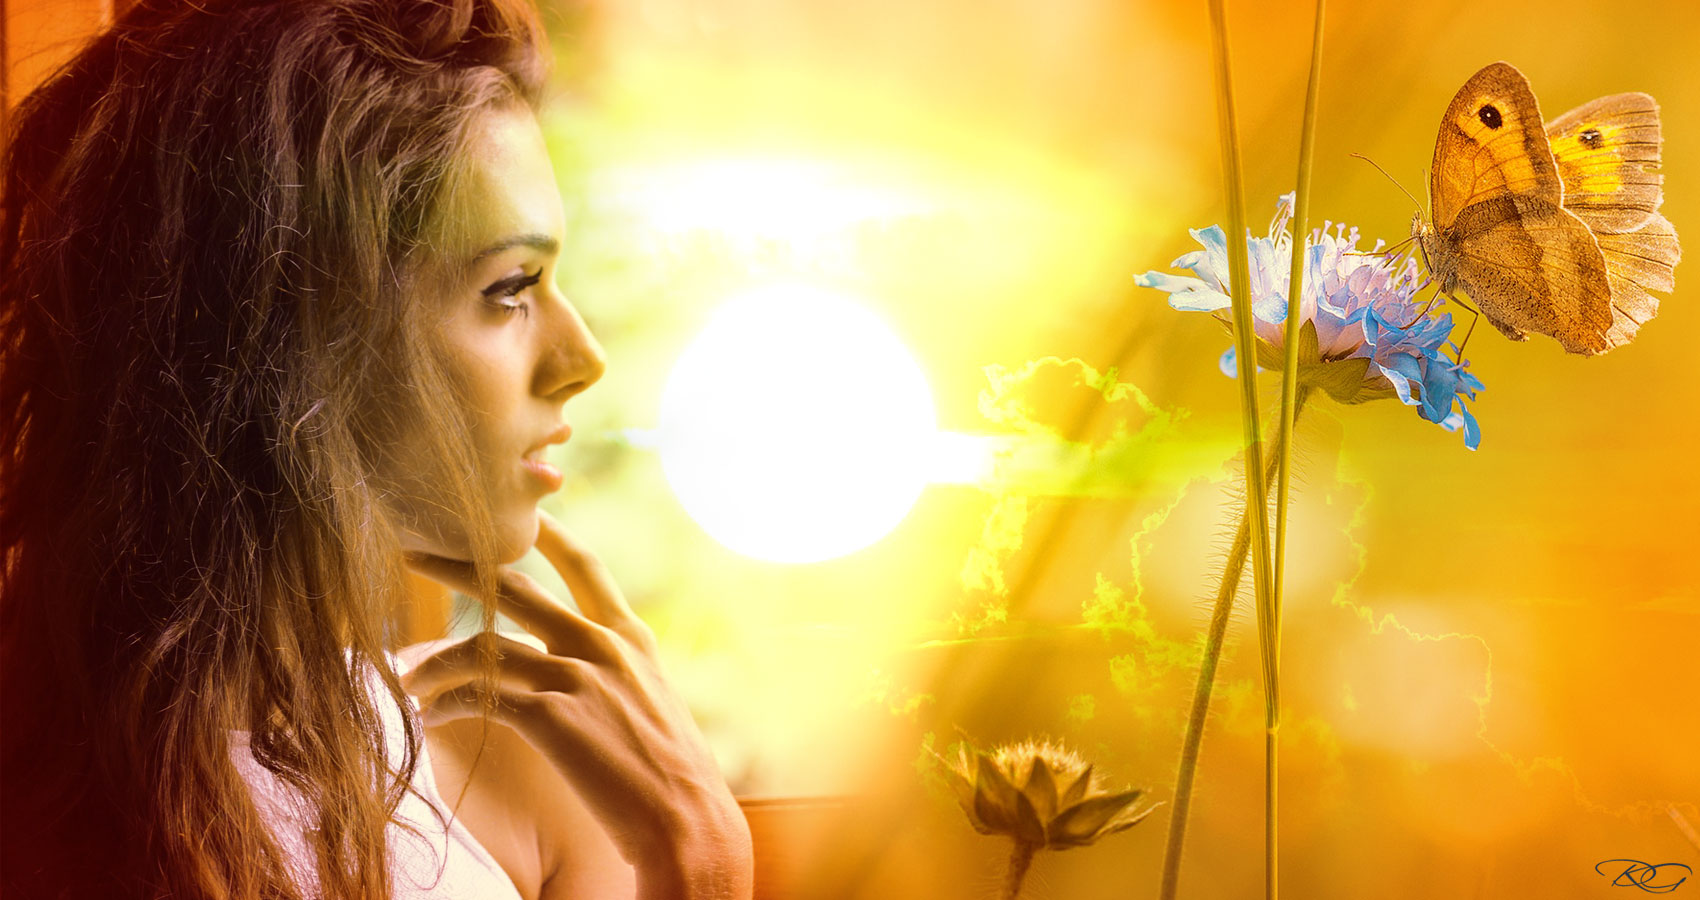 Daybreak, a poem by Jack London at Spillwords.com